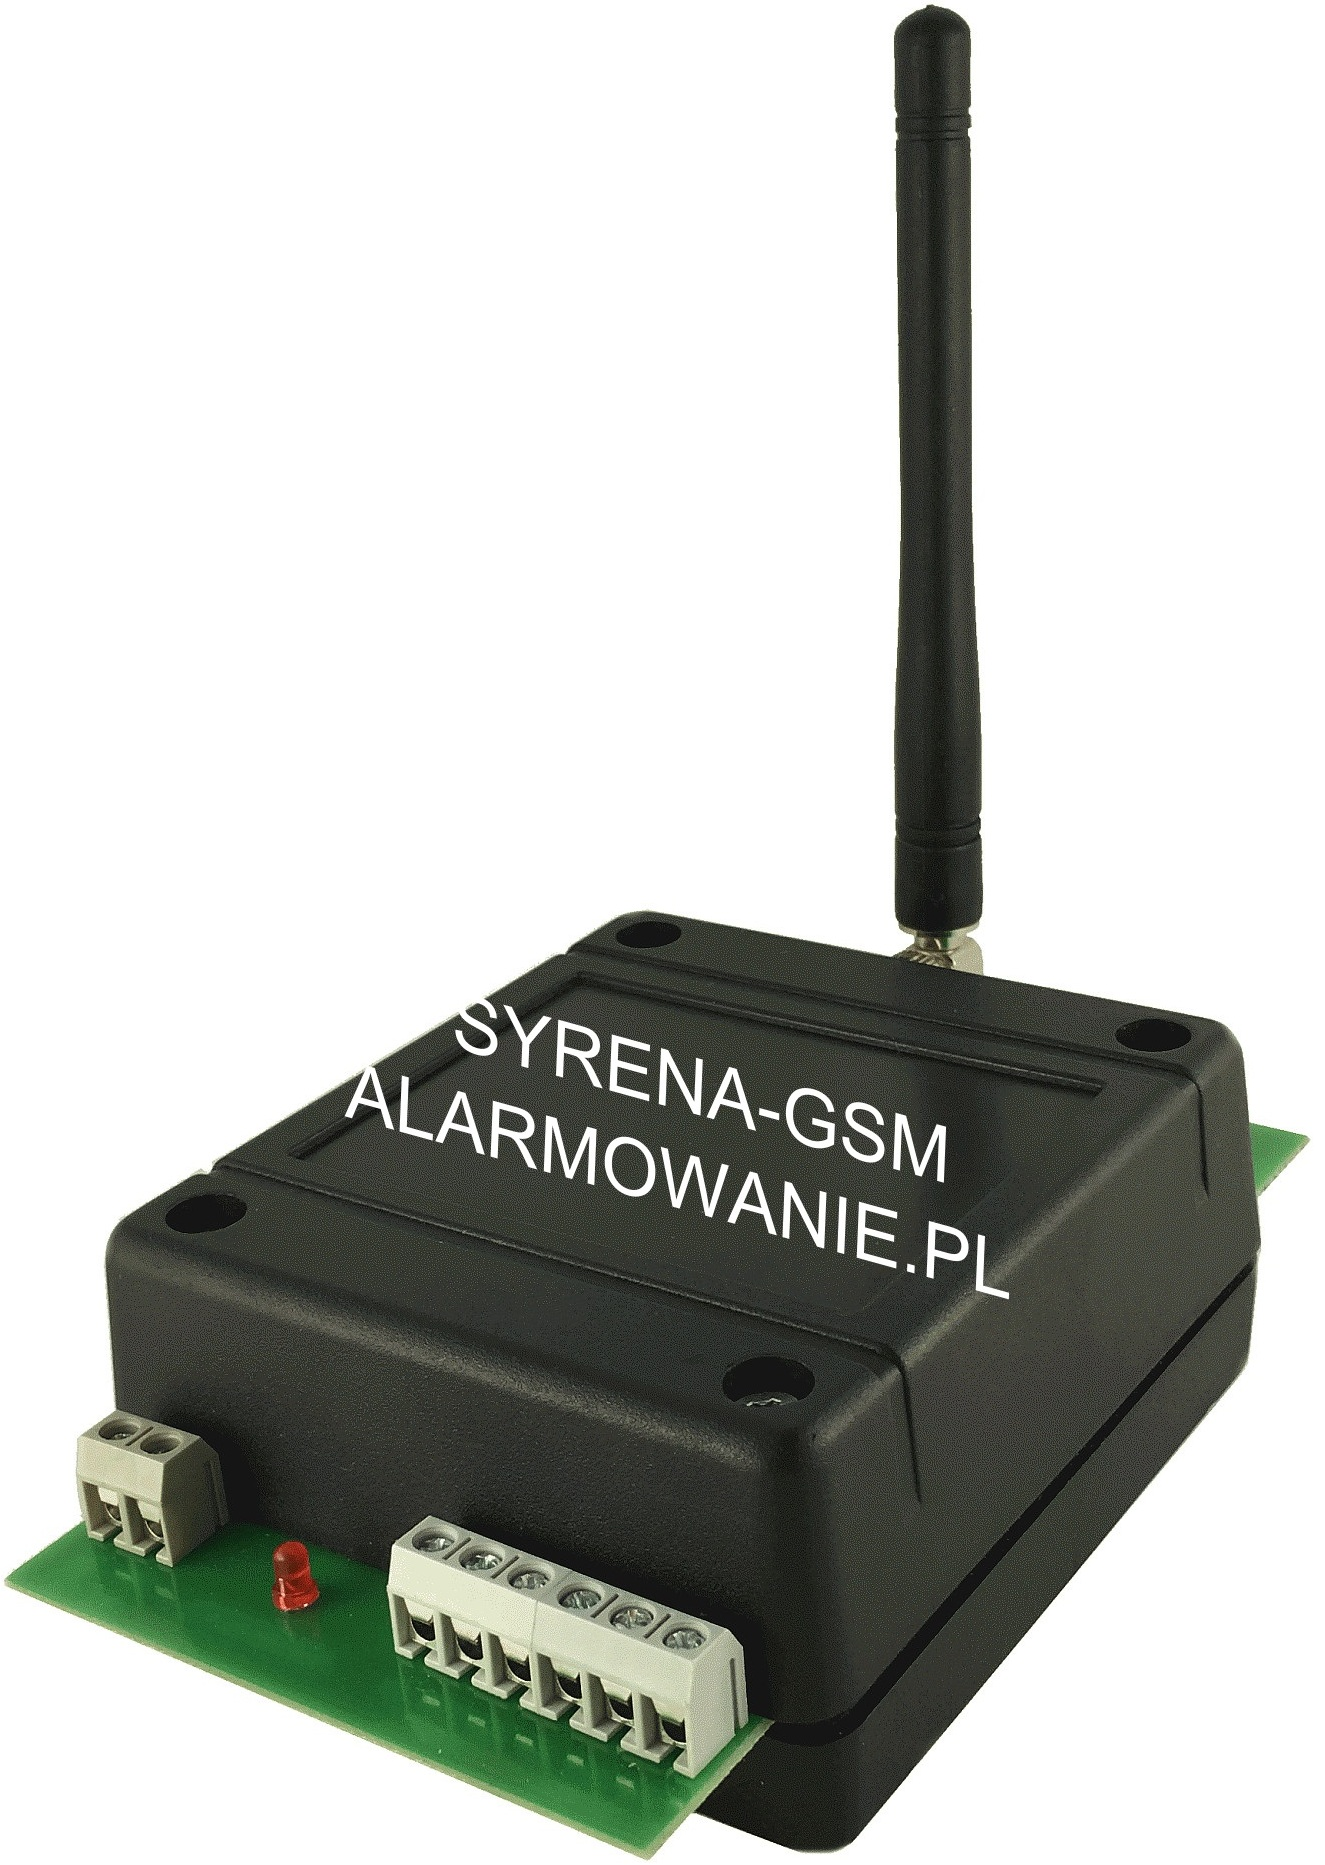 syrena-gsm